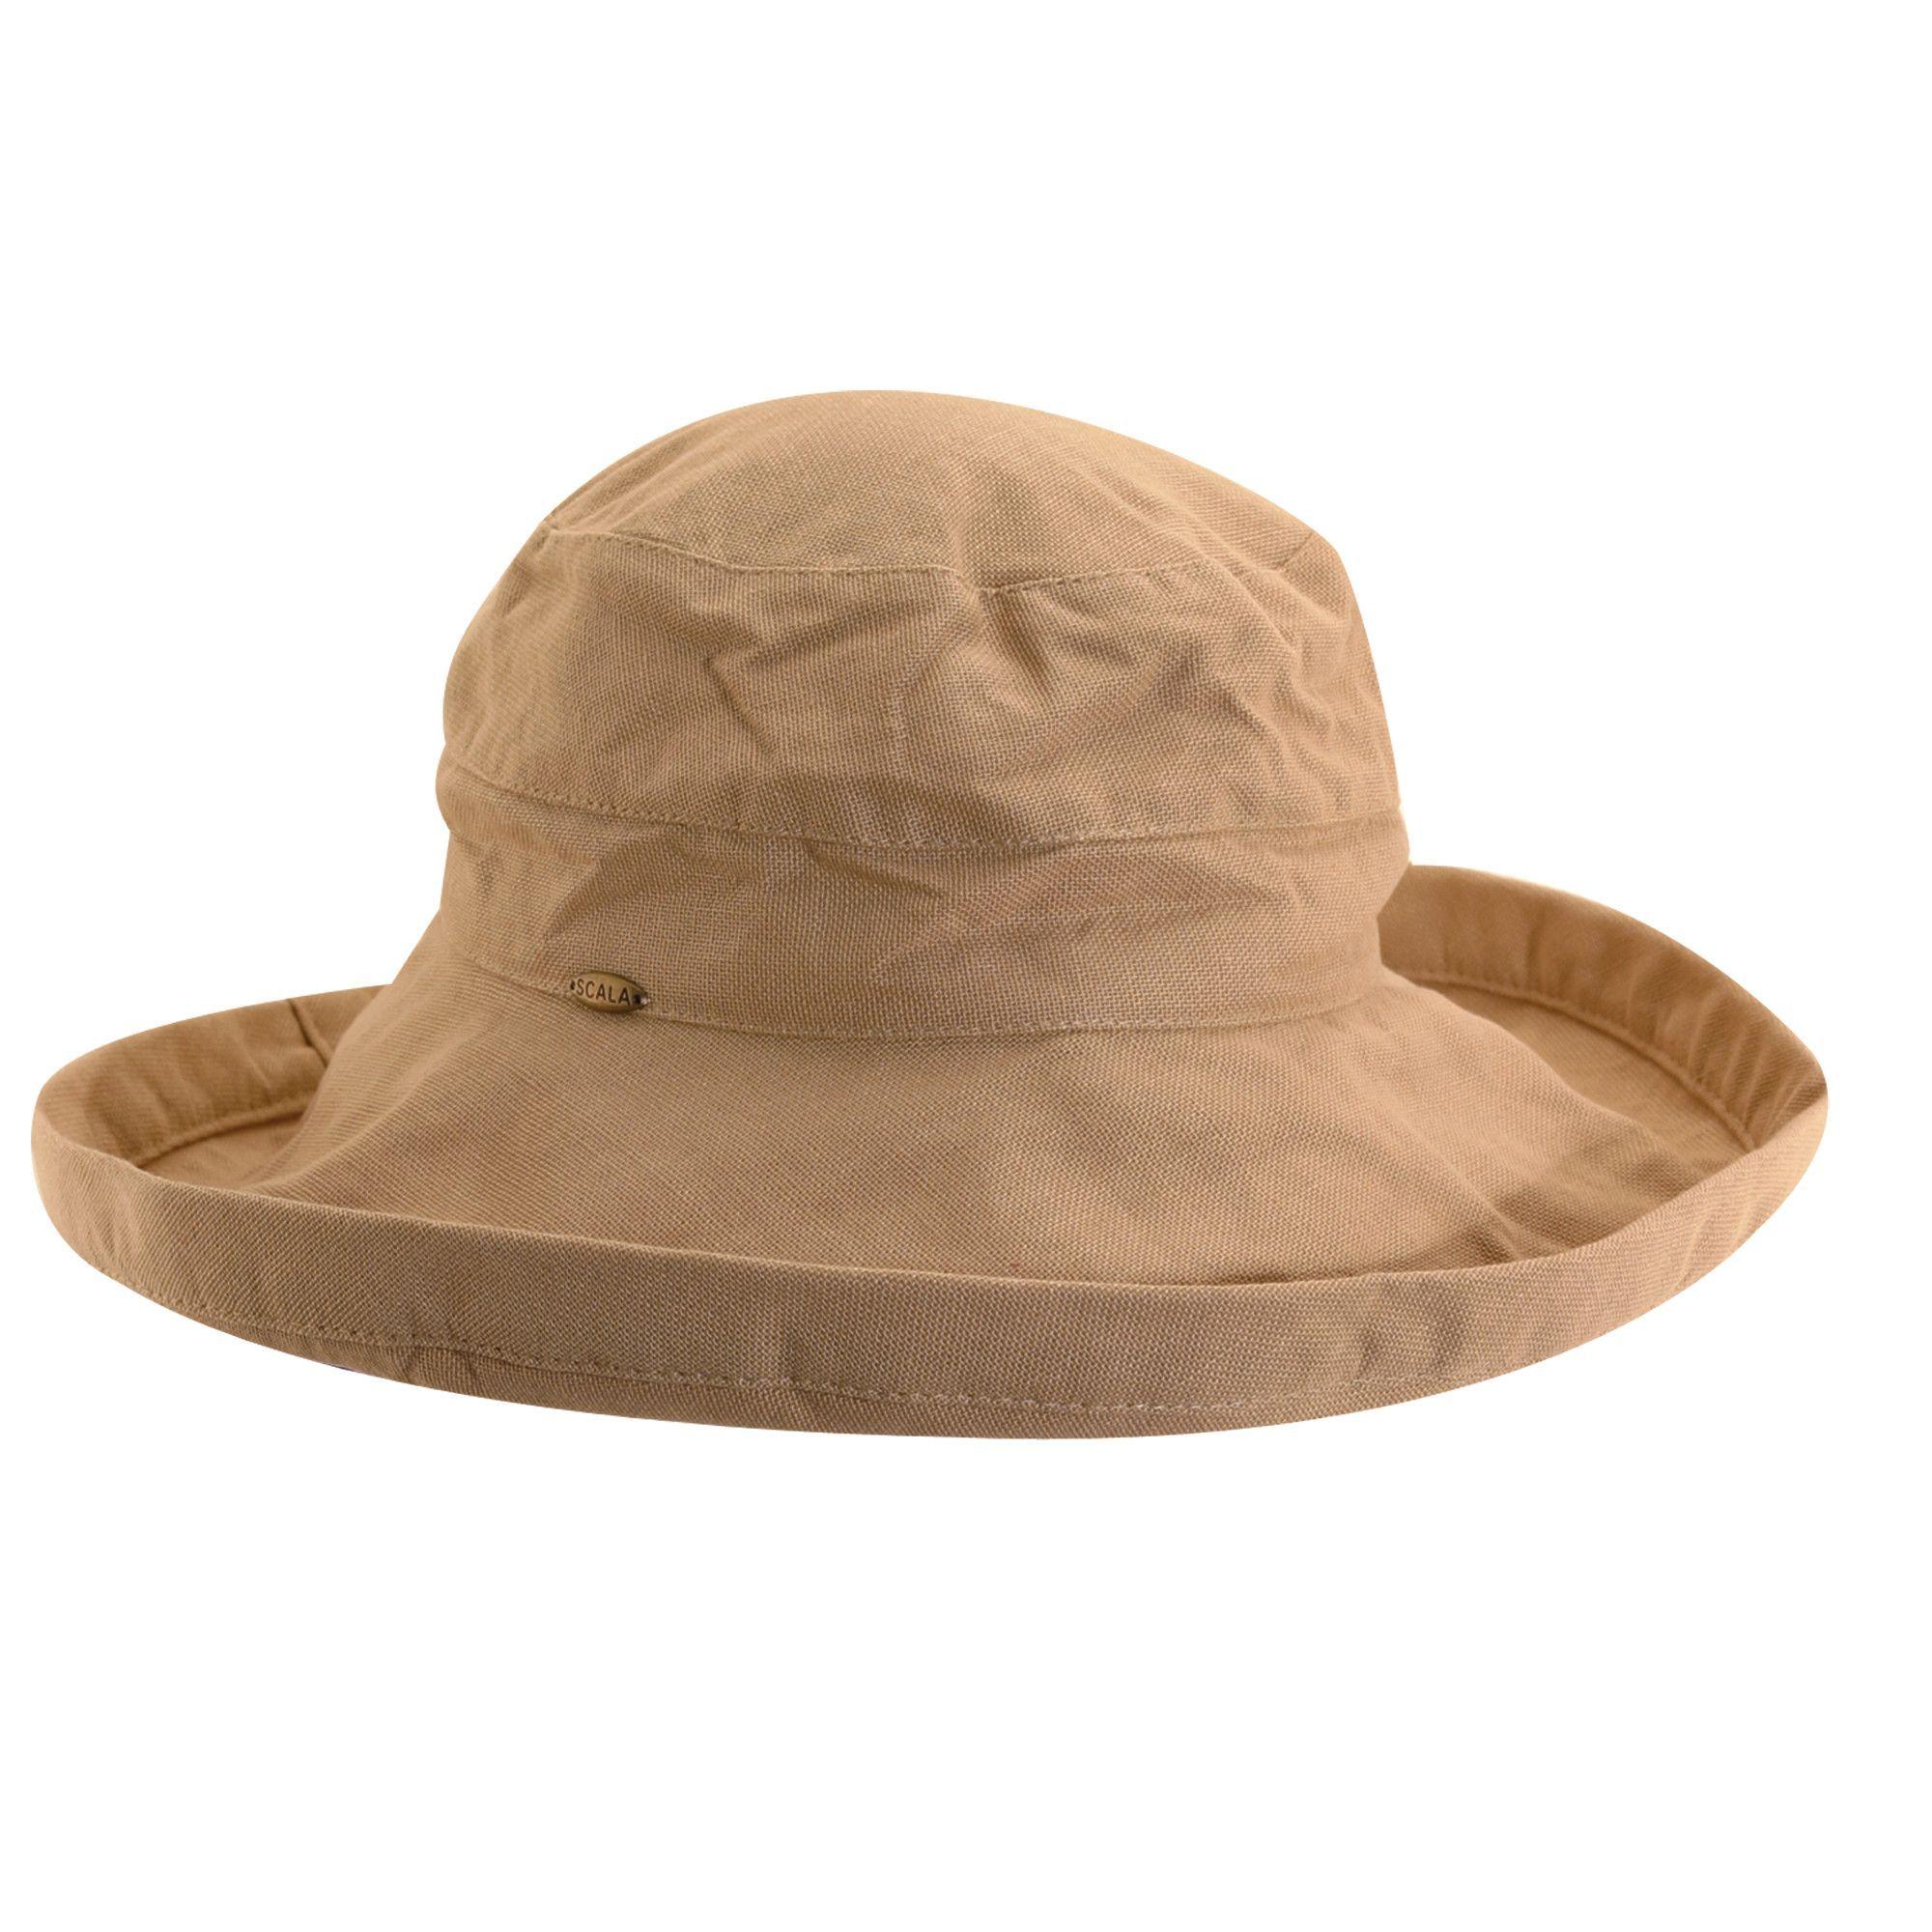 3dc622be1 Scala Women's Cotton 4 Inch Brim UPF 50+ Travel Sun Hat | Products ...